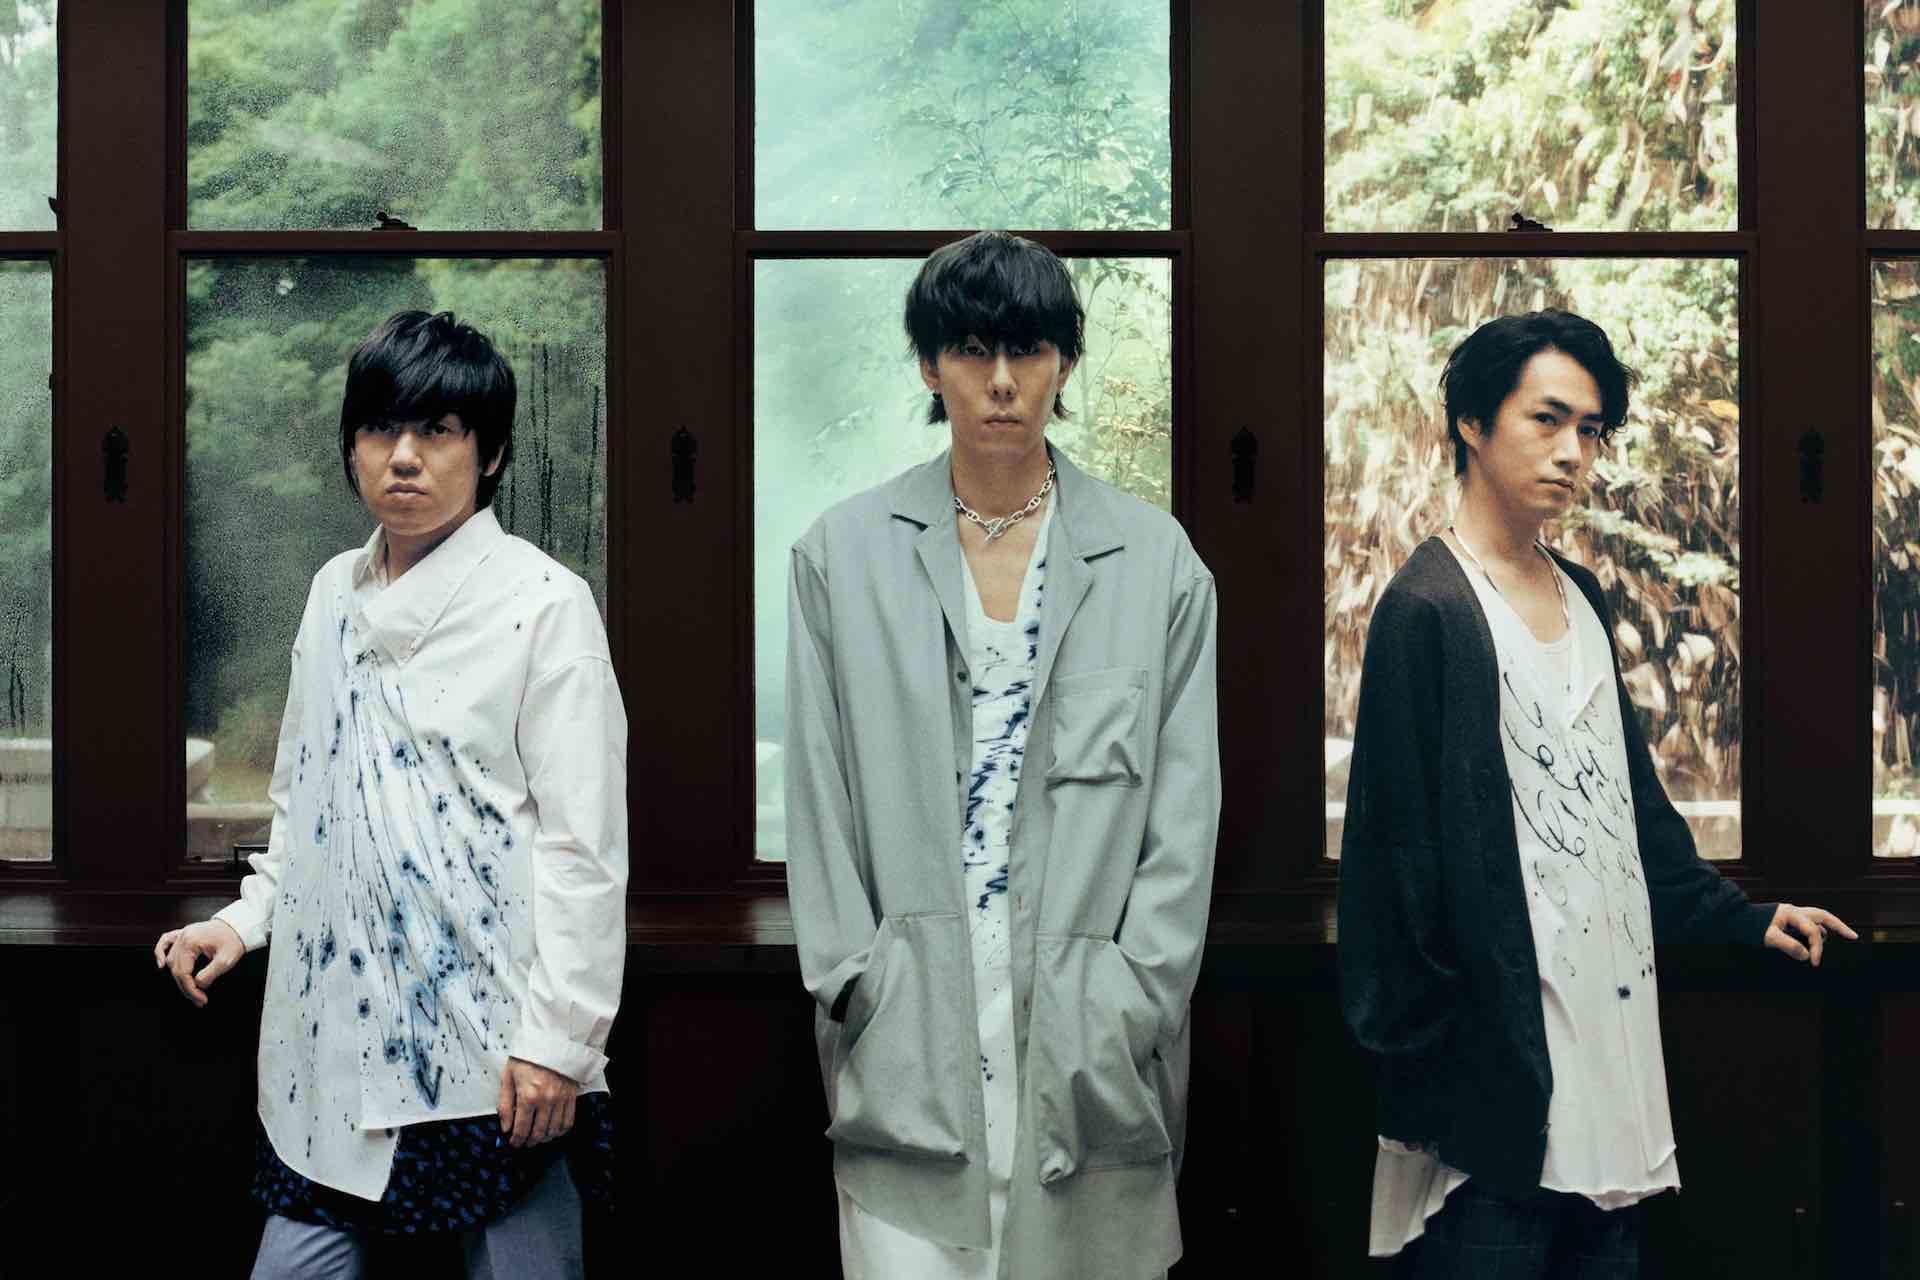 RADWIMPSアルバム『天気の子』が本日発売!「愛にできることはまだあるかい」MVも公開 music190719_radwimps_tenkinoko_1-1920x1280